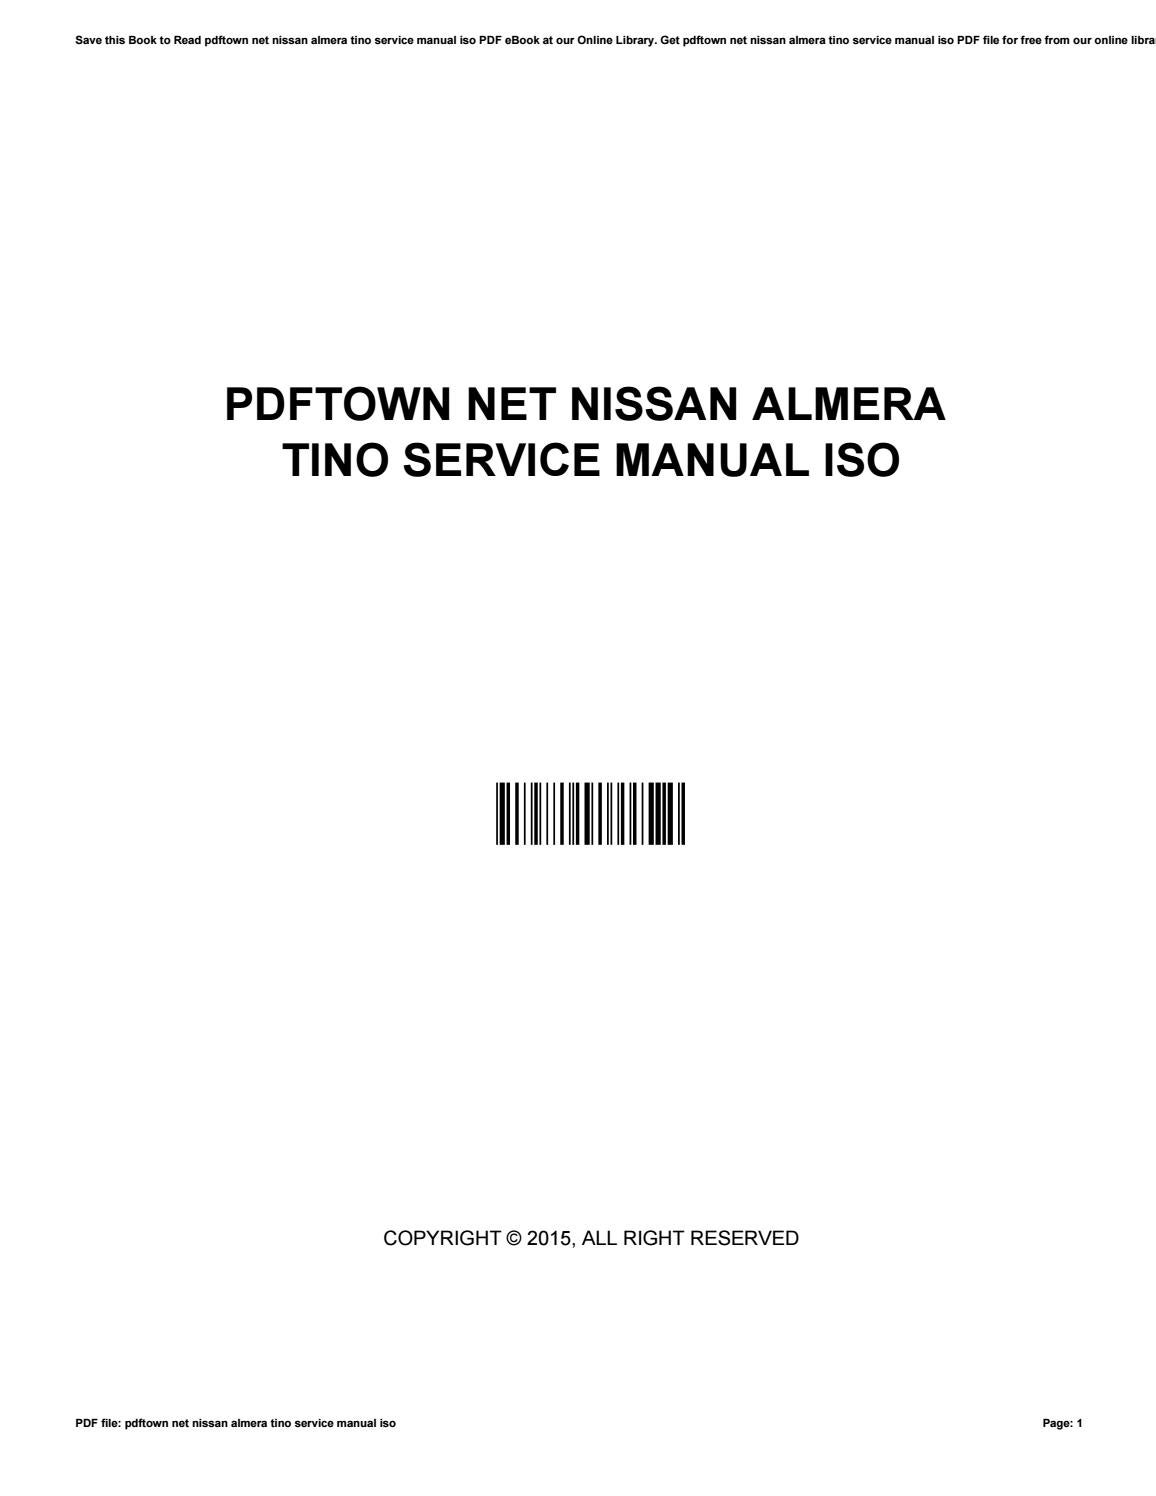 ... Array - nissan almera 2015 service manual rh signaturepedagogies org uk